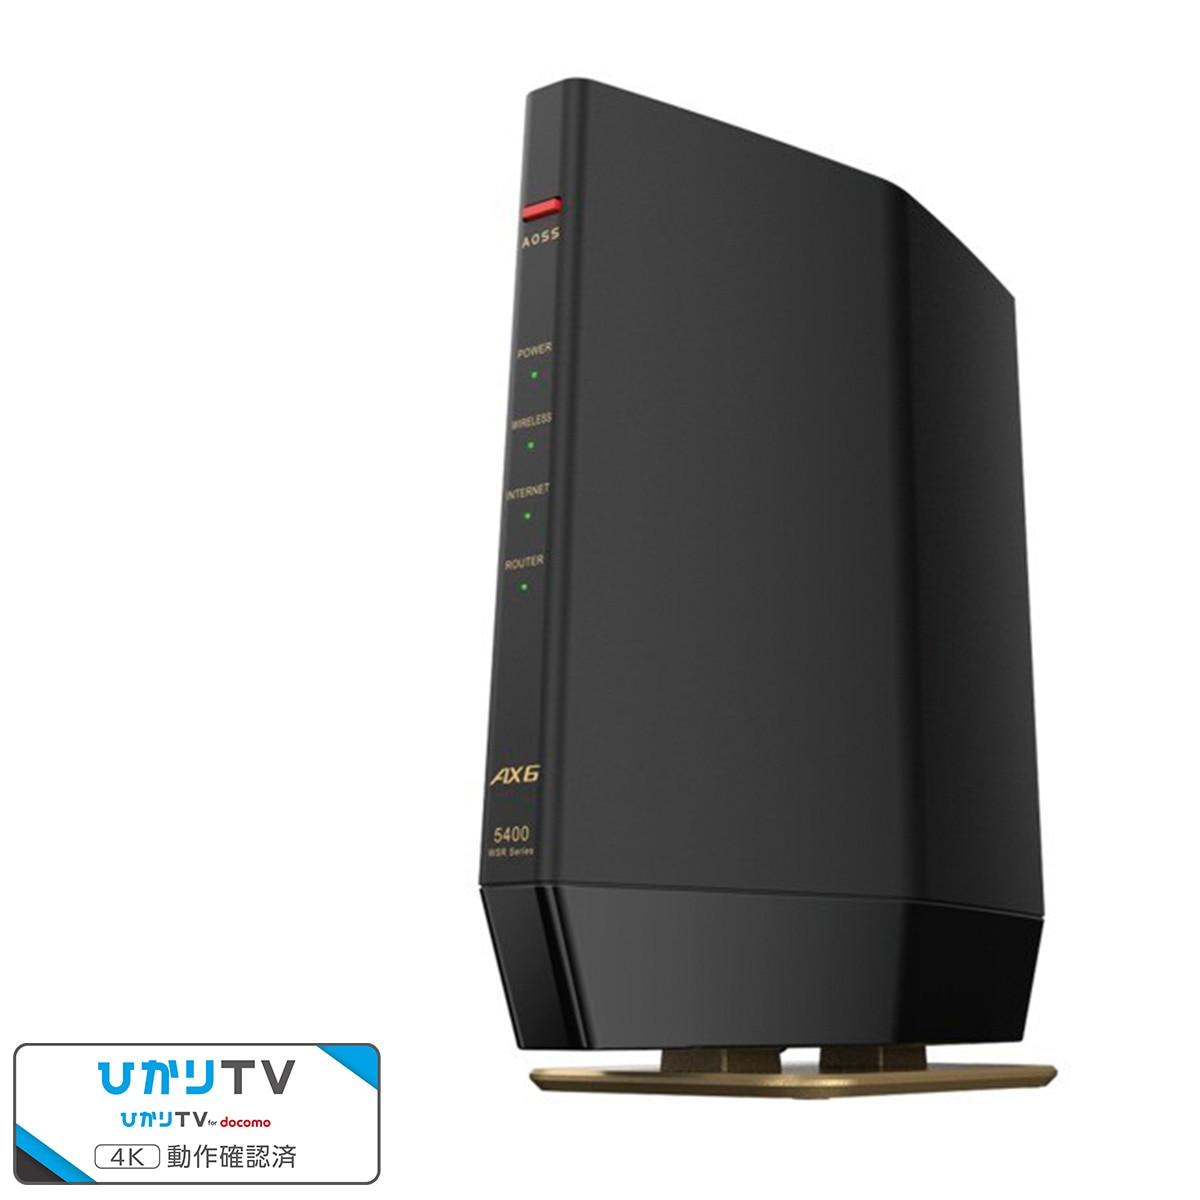 BUFFALO 無線LAN親機 WiFiルーター 11ax/ac/n/a/g/b 4803+573Mbps WiFi6/Ipv6対応 マットブラック WSR-5400AX6S/DMB